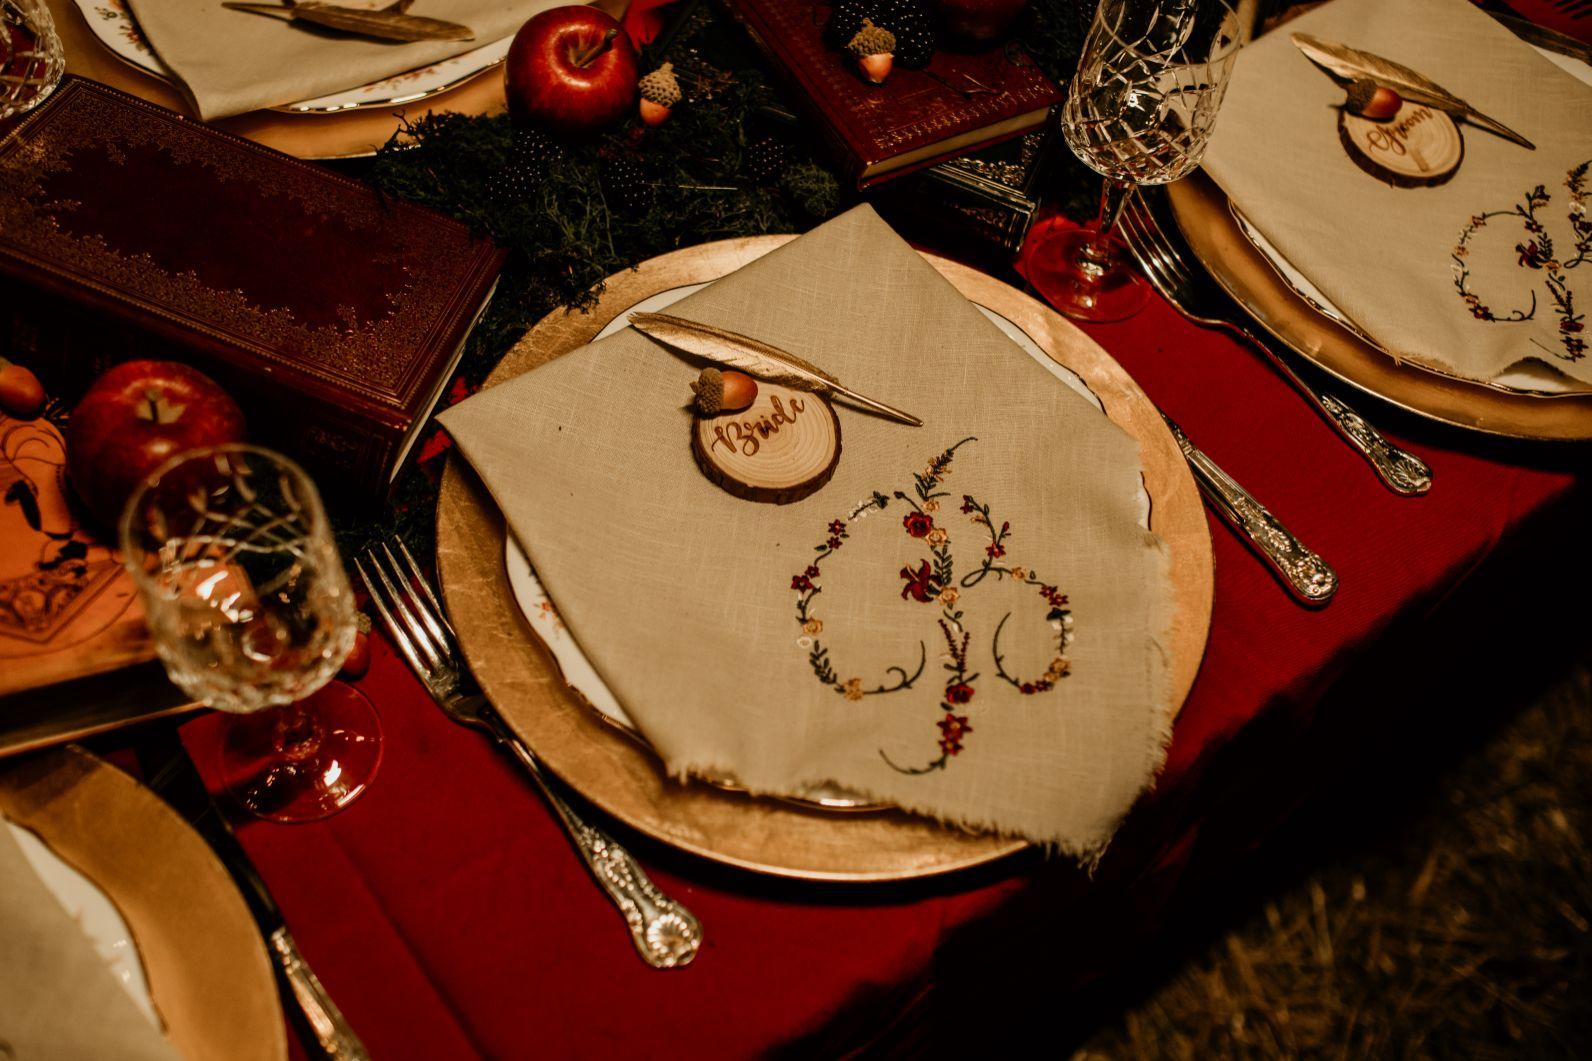 alternative fairytale wedding- snow white wedding- charlotte laurie designs-chloe mary photo- unconventional wedding- alternative wedding inspiration-unique wedding table ideas